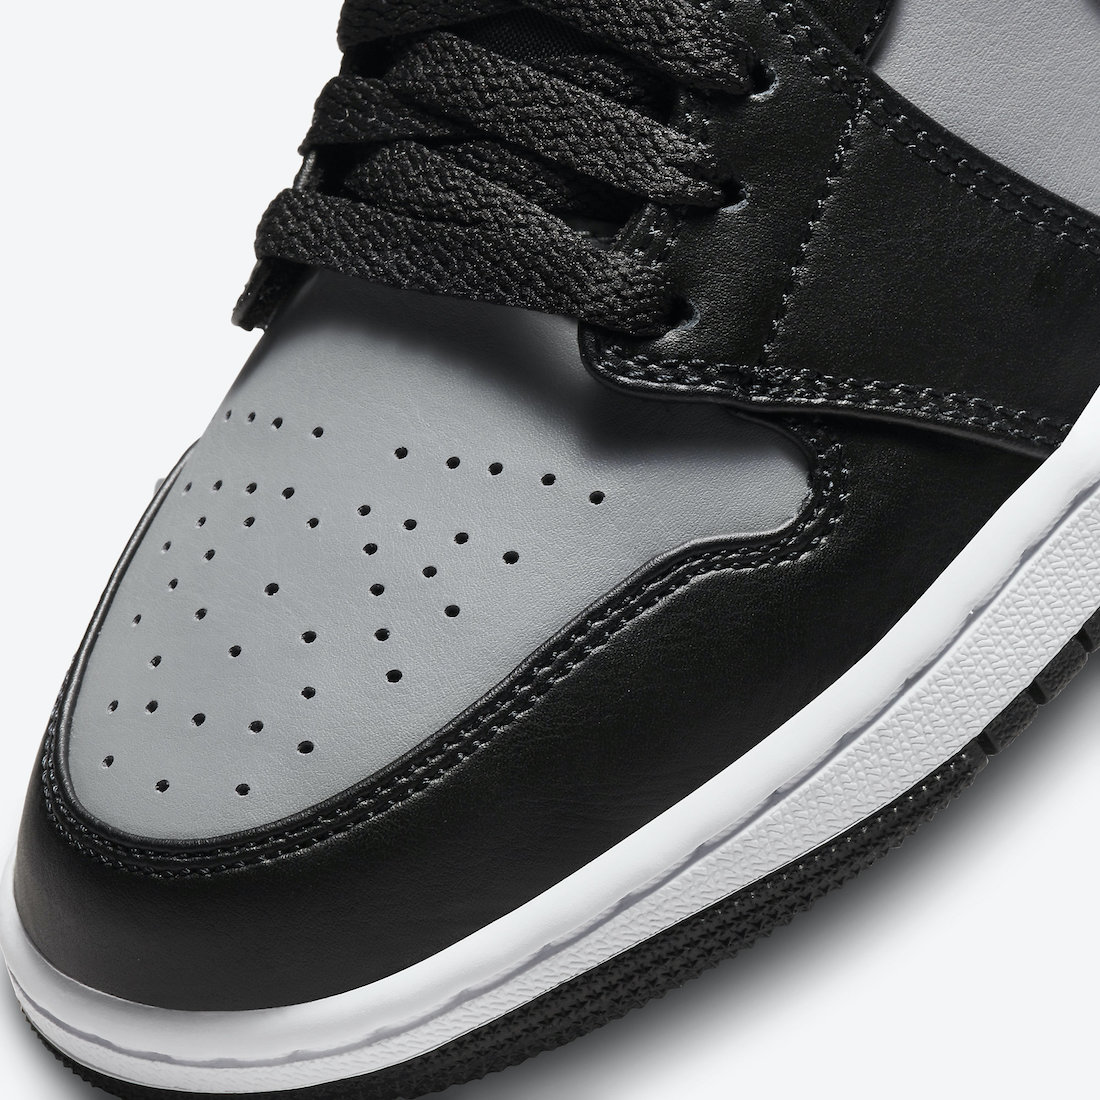 Air Jordan 1 Mid Black Grey Red 554724-096 Release Date Info